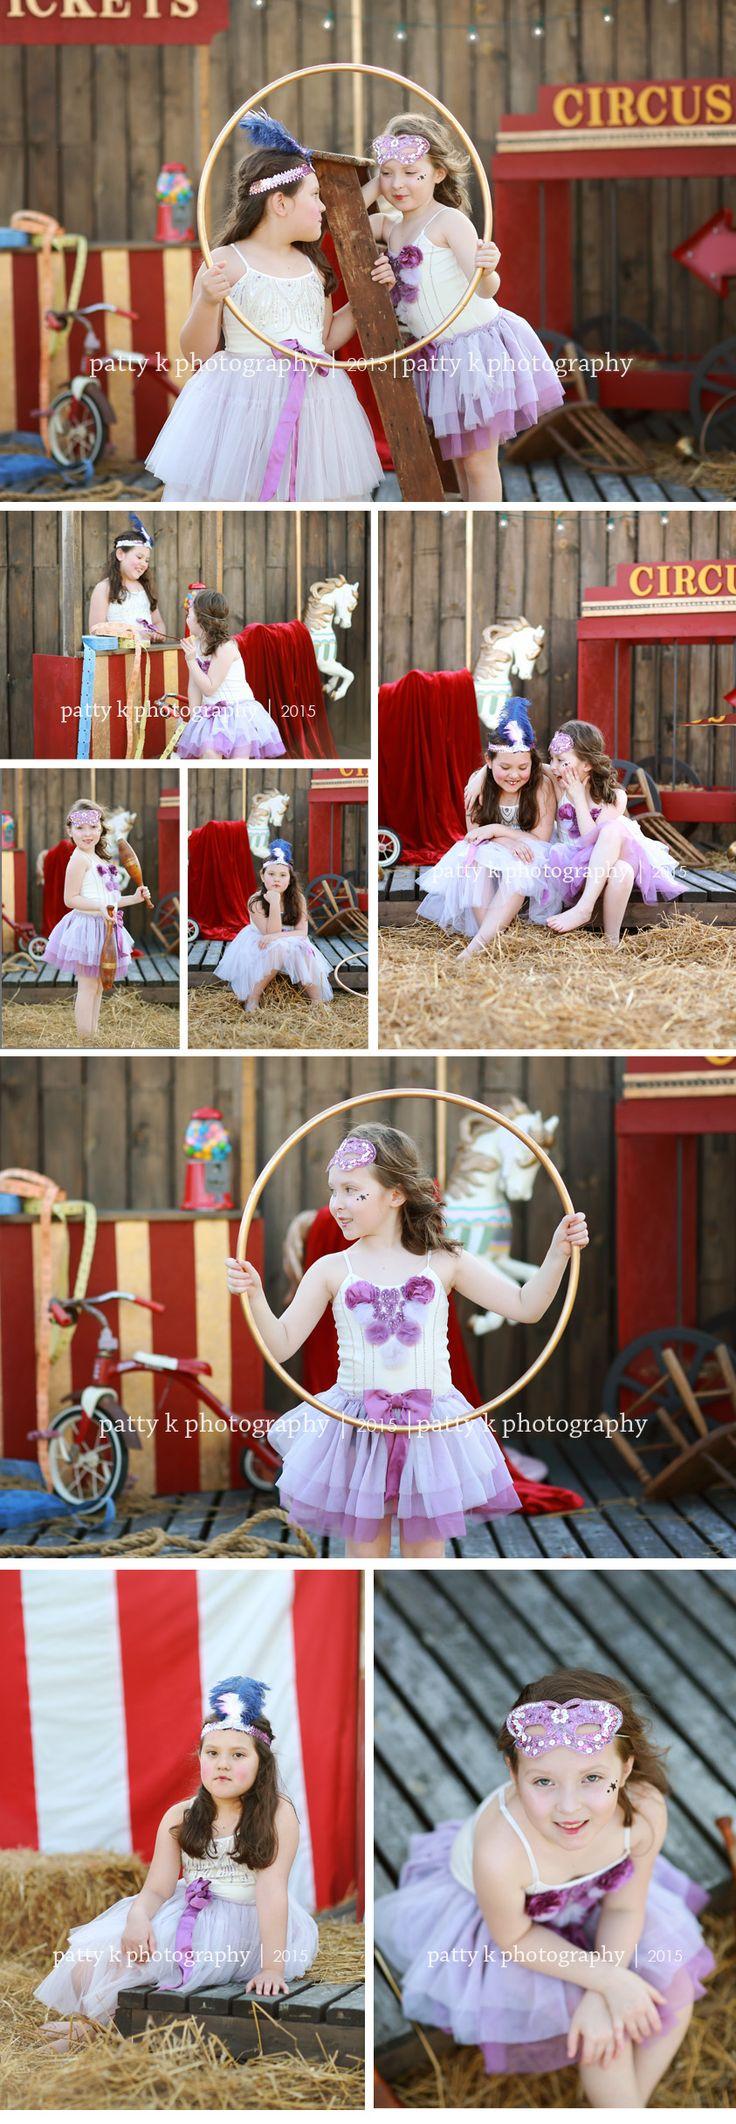 Circus Minis | Imagination Session | Mattea & Marissa | Raeford, NC Child Photographer | Patty K Photography